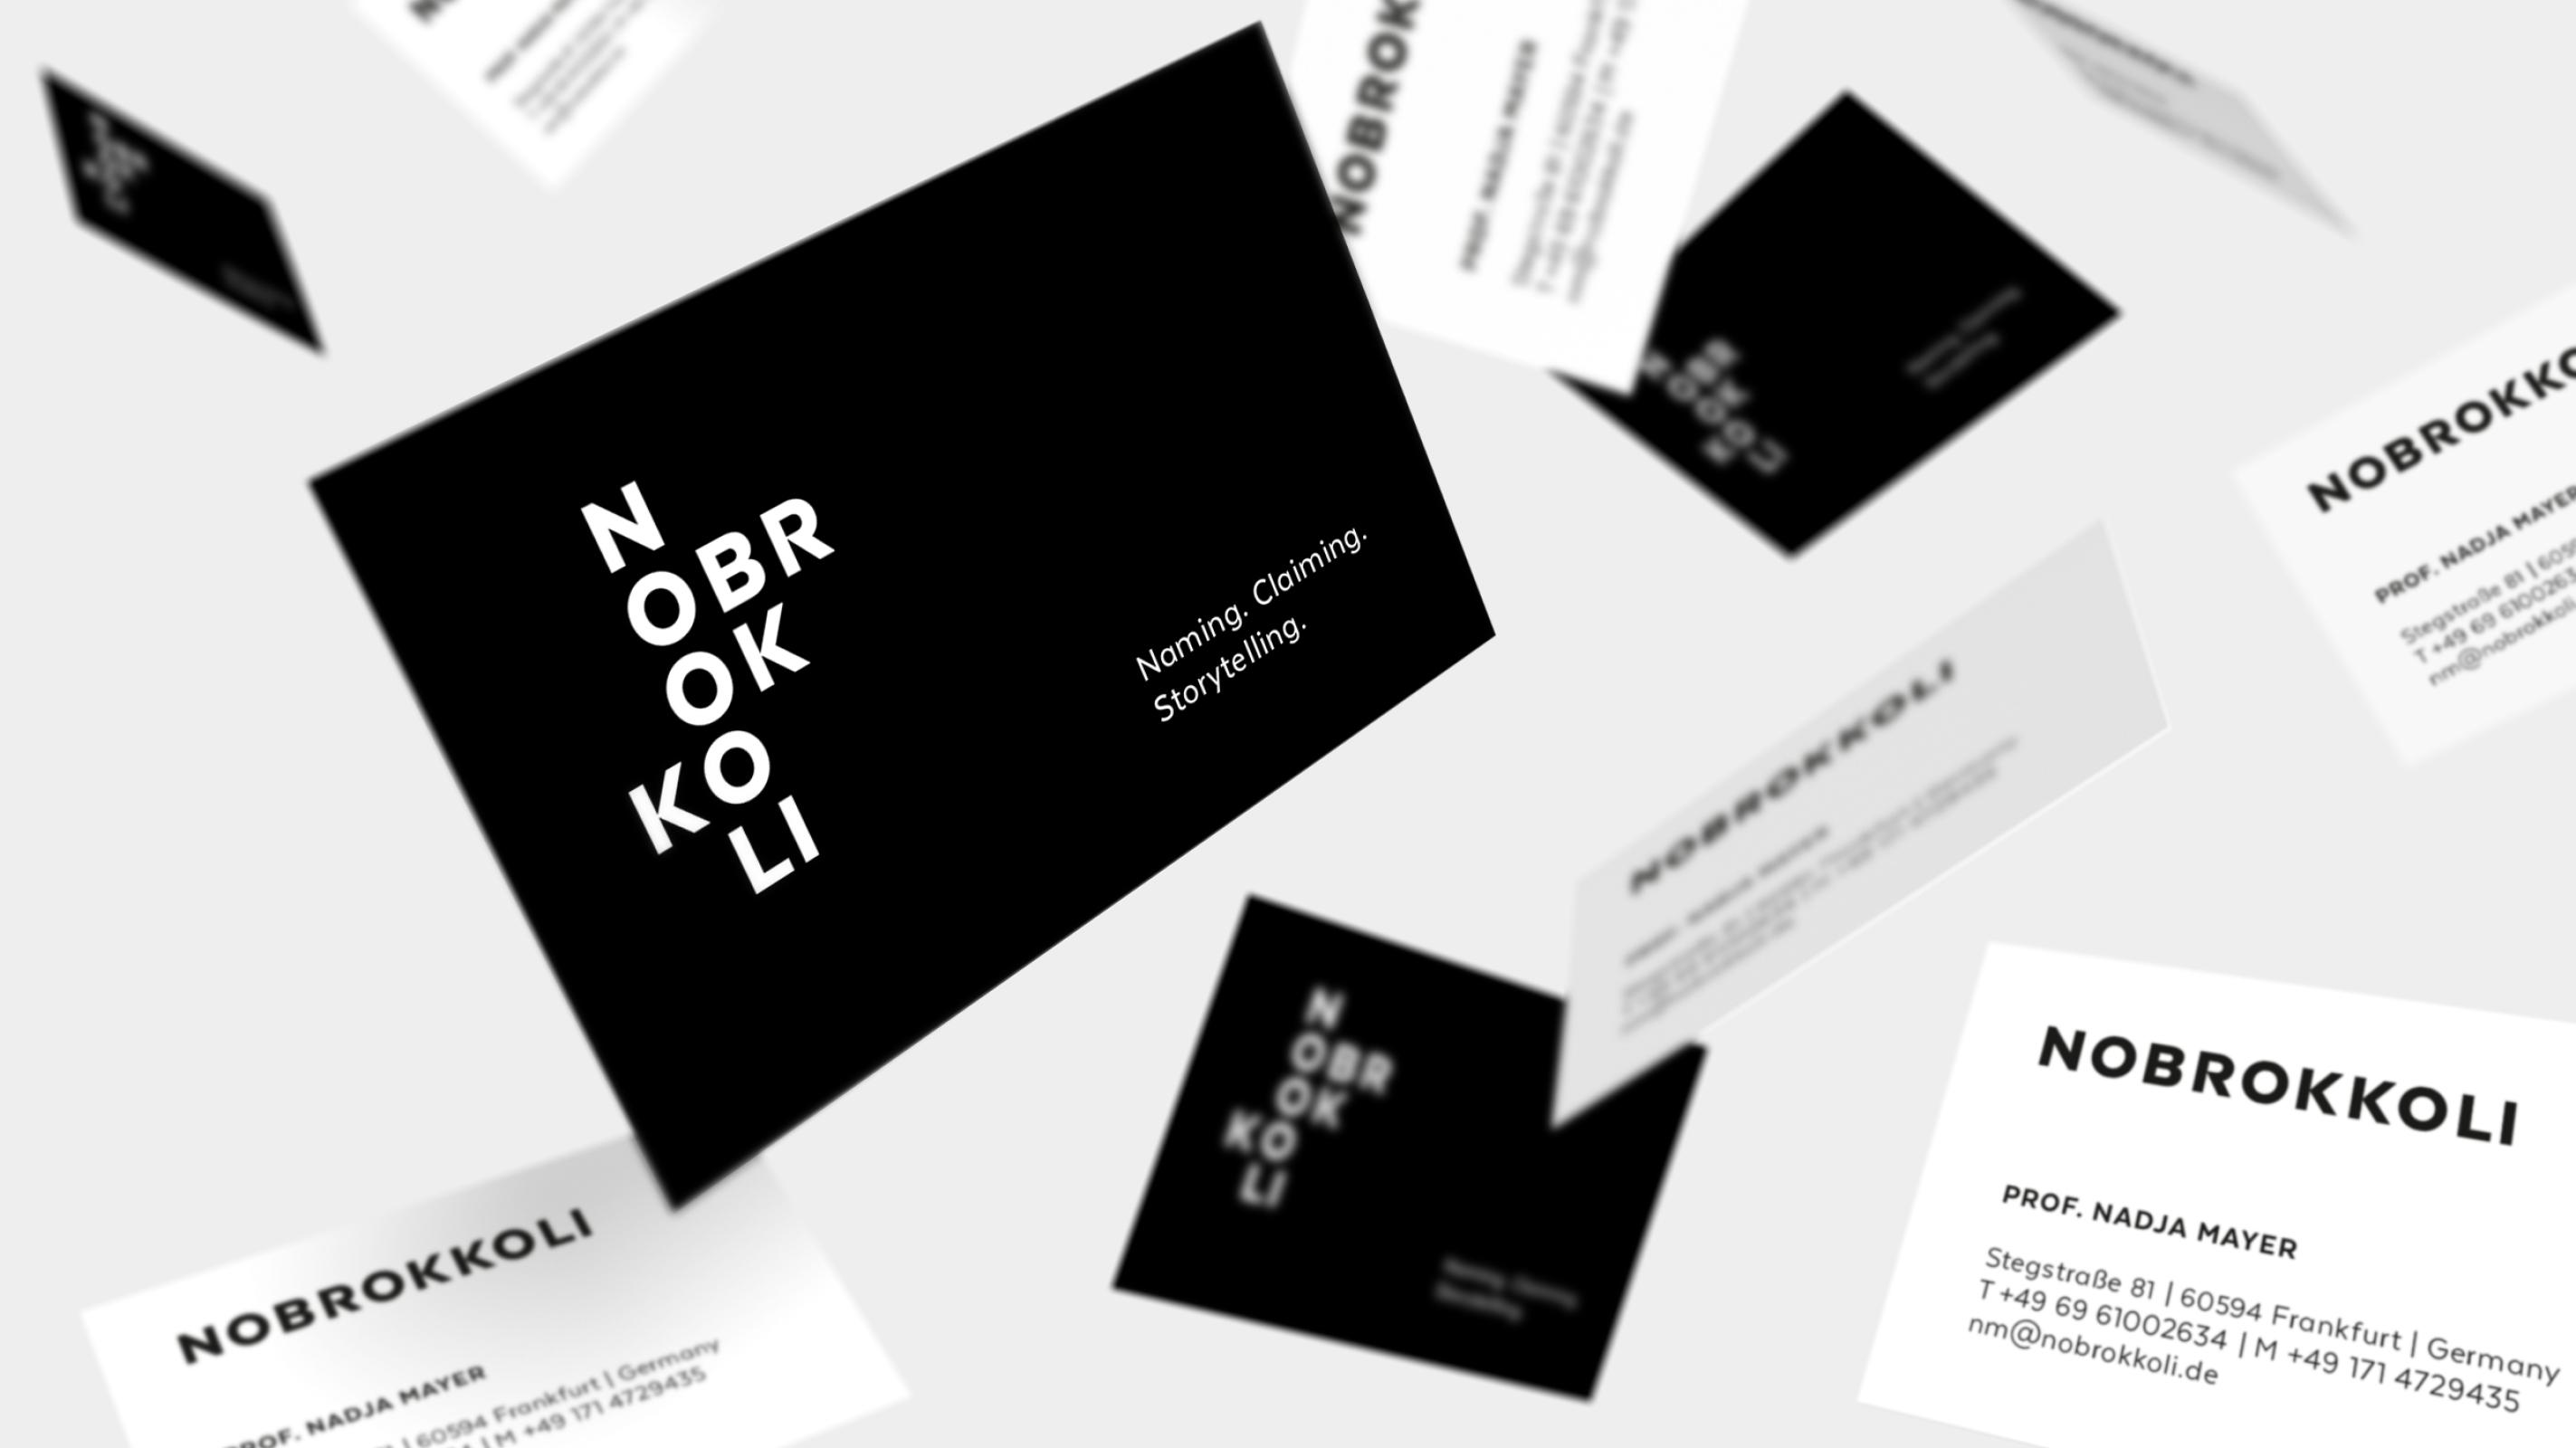 Nobrokkoli – Poarangan Brand Design4